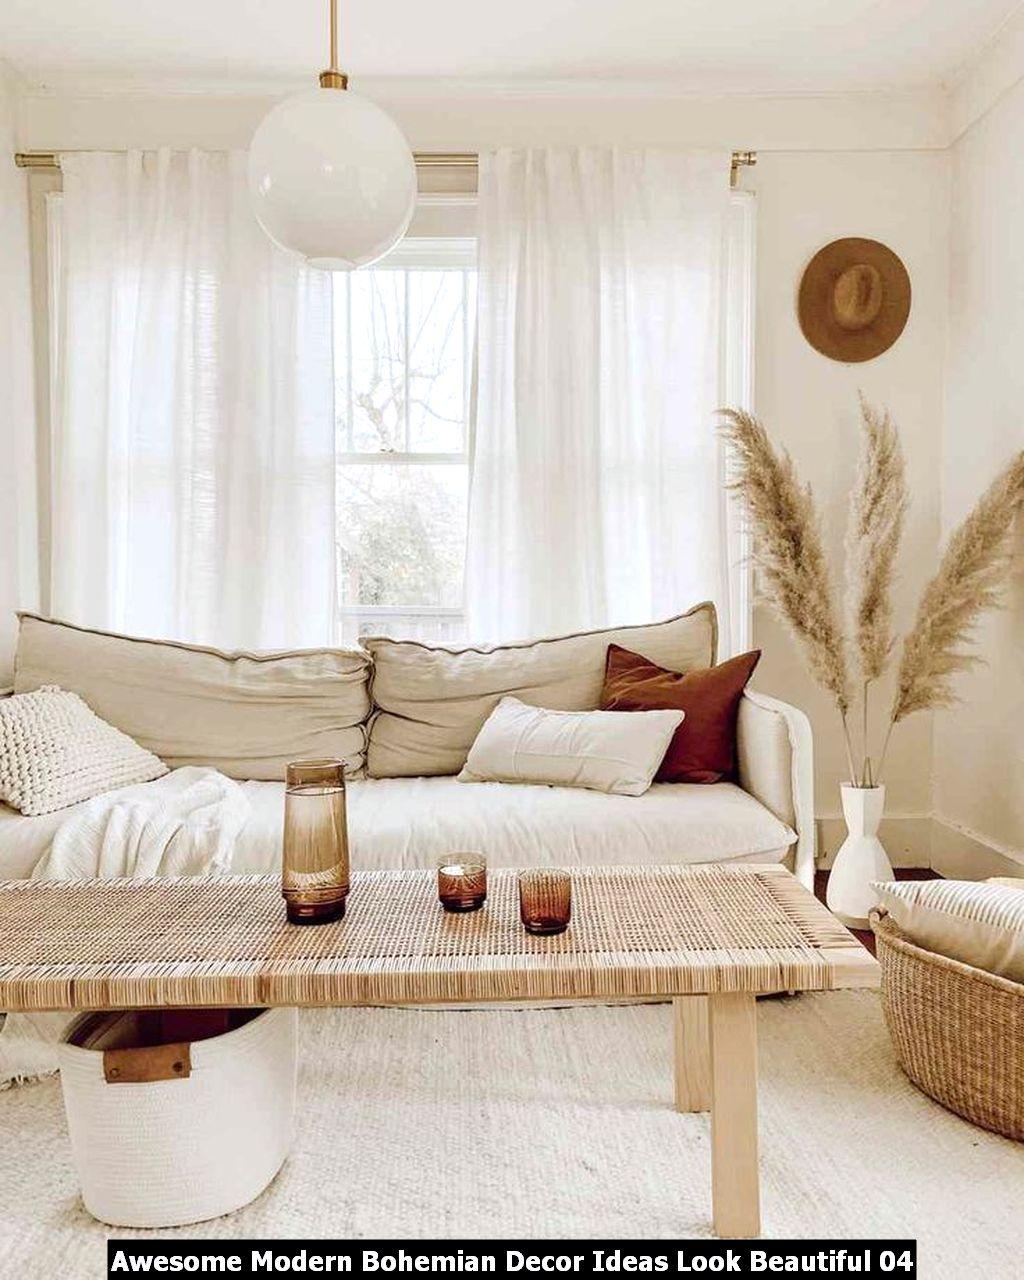 Awesome Modern Bohemian Decor Ideas Look Beautiful 04